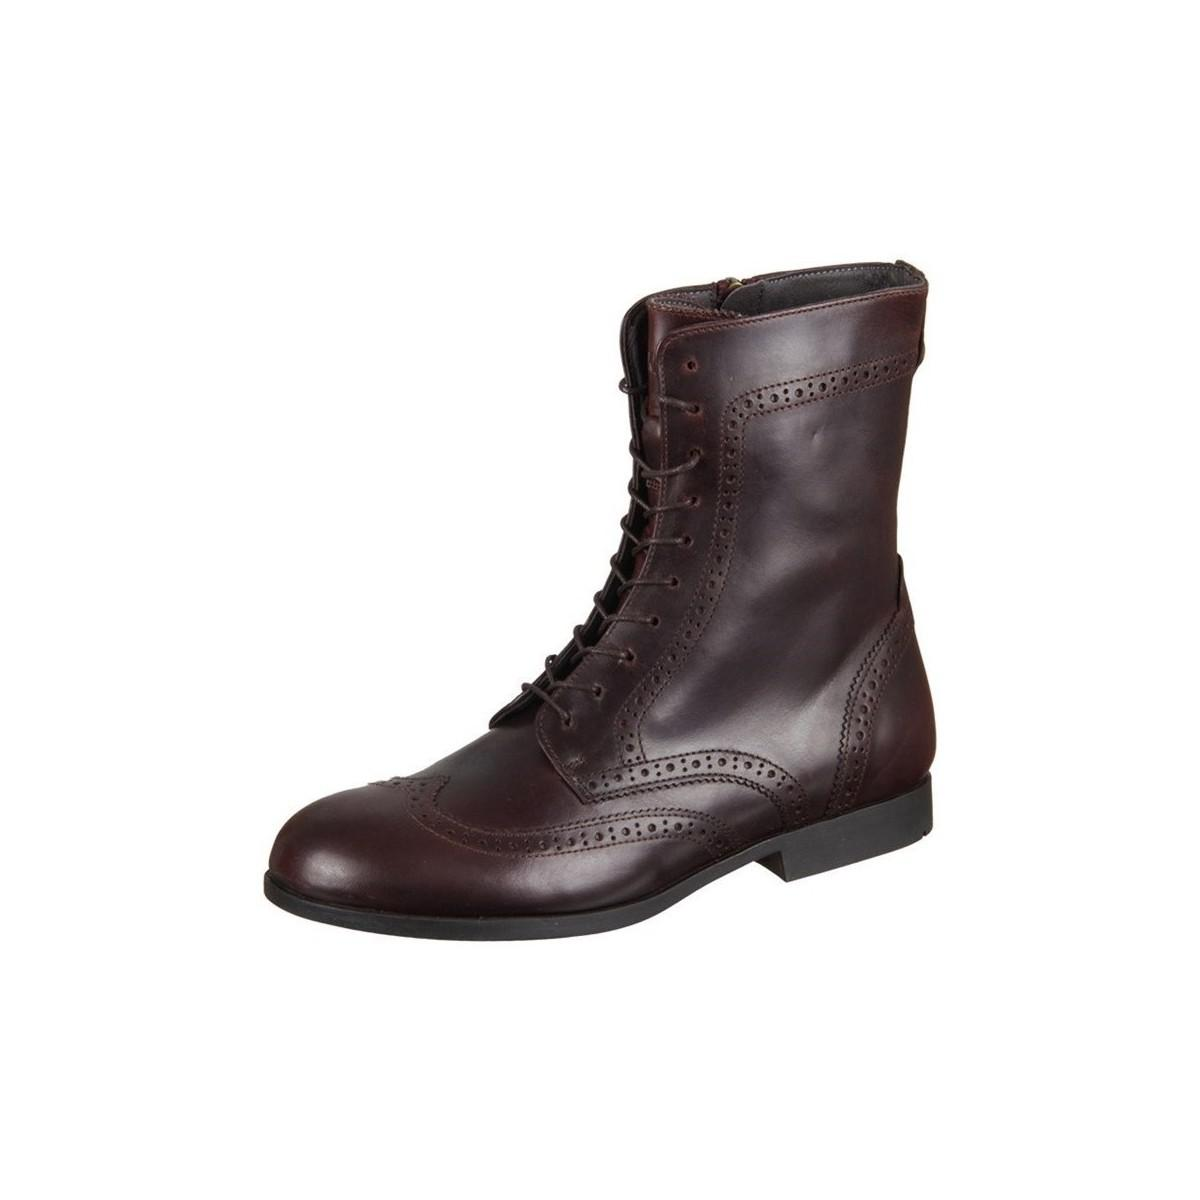 17f6a0e0246ba Birkenstock Laramie Mahagoni Natural Leather Women's High Boots In ...